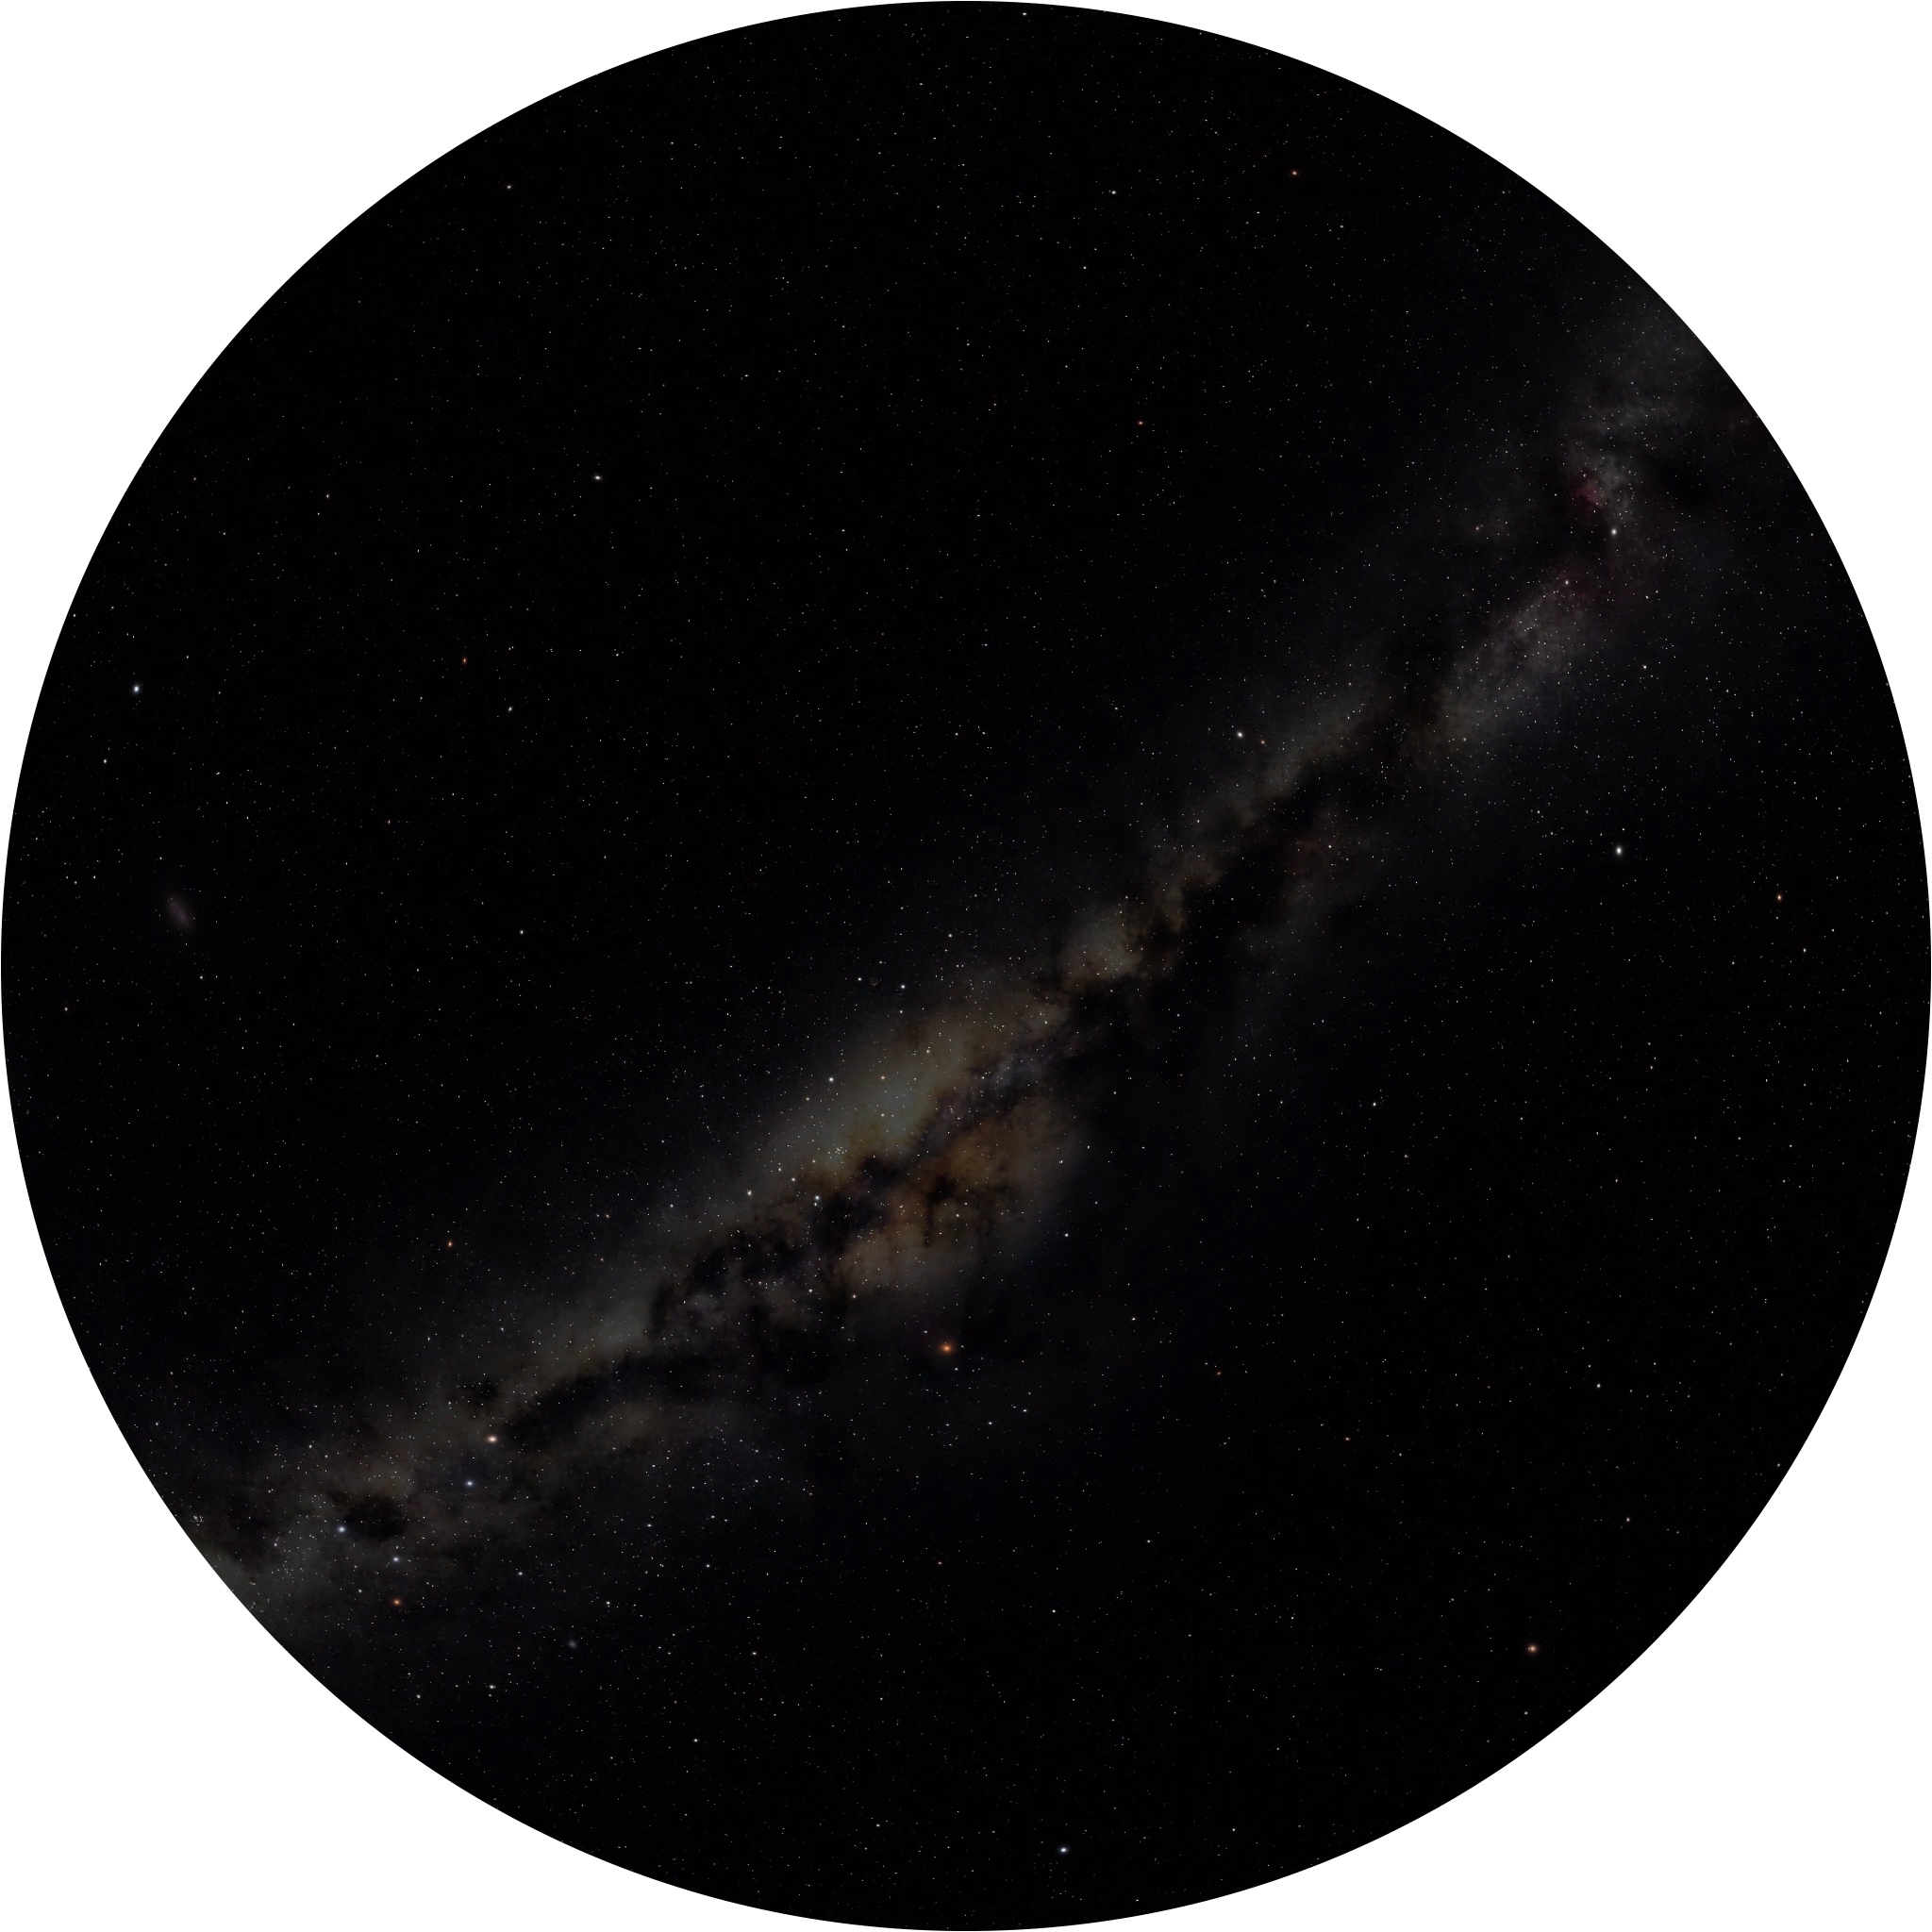 StarSystem_MilkyWay.jpg